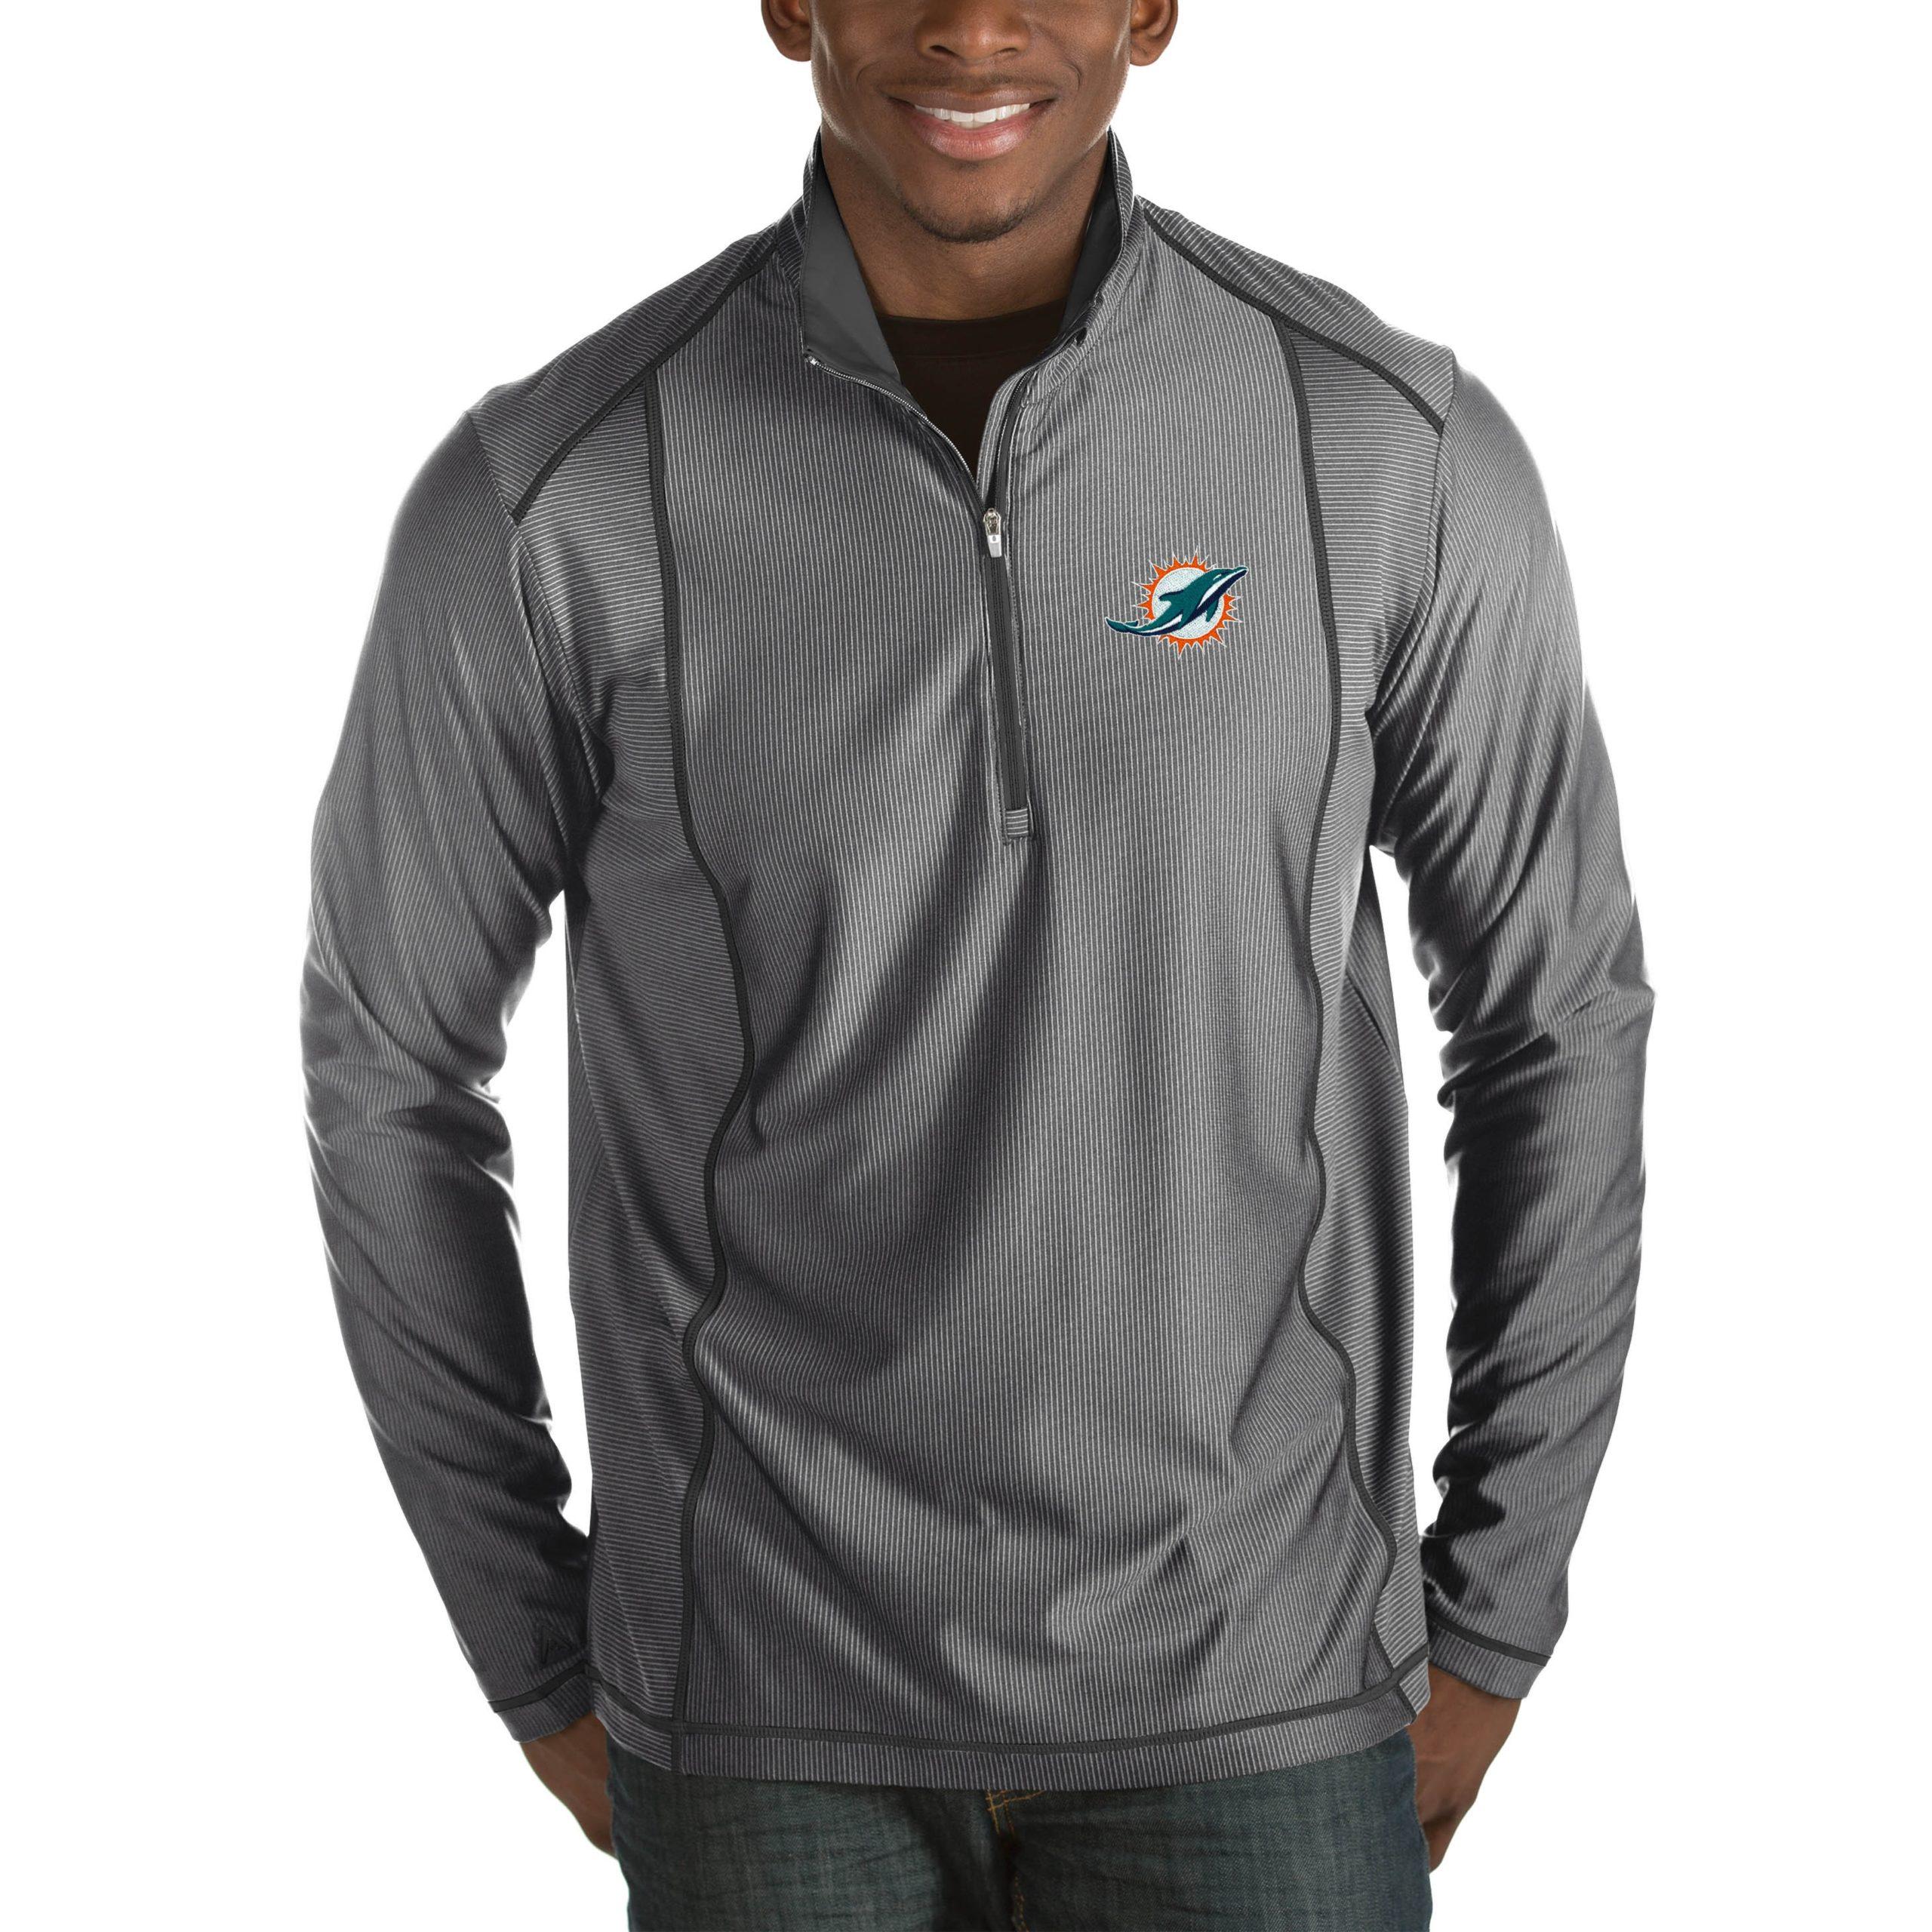 Miami Dolphins Antigua Tempo Big & Tall Half-Zip Pullover Jacket - Heather Charcoal